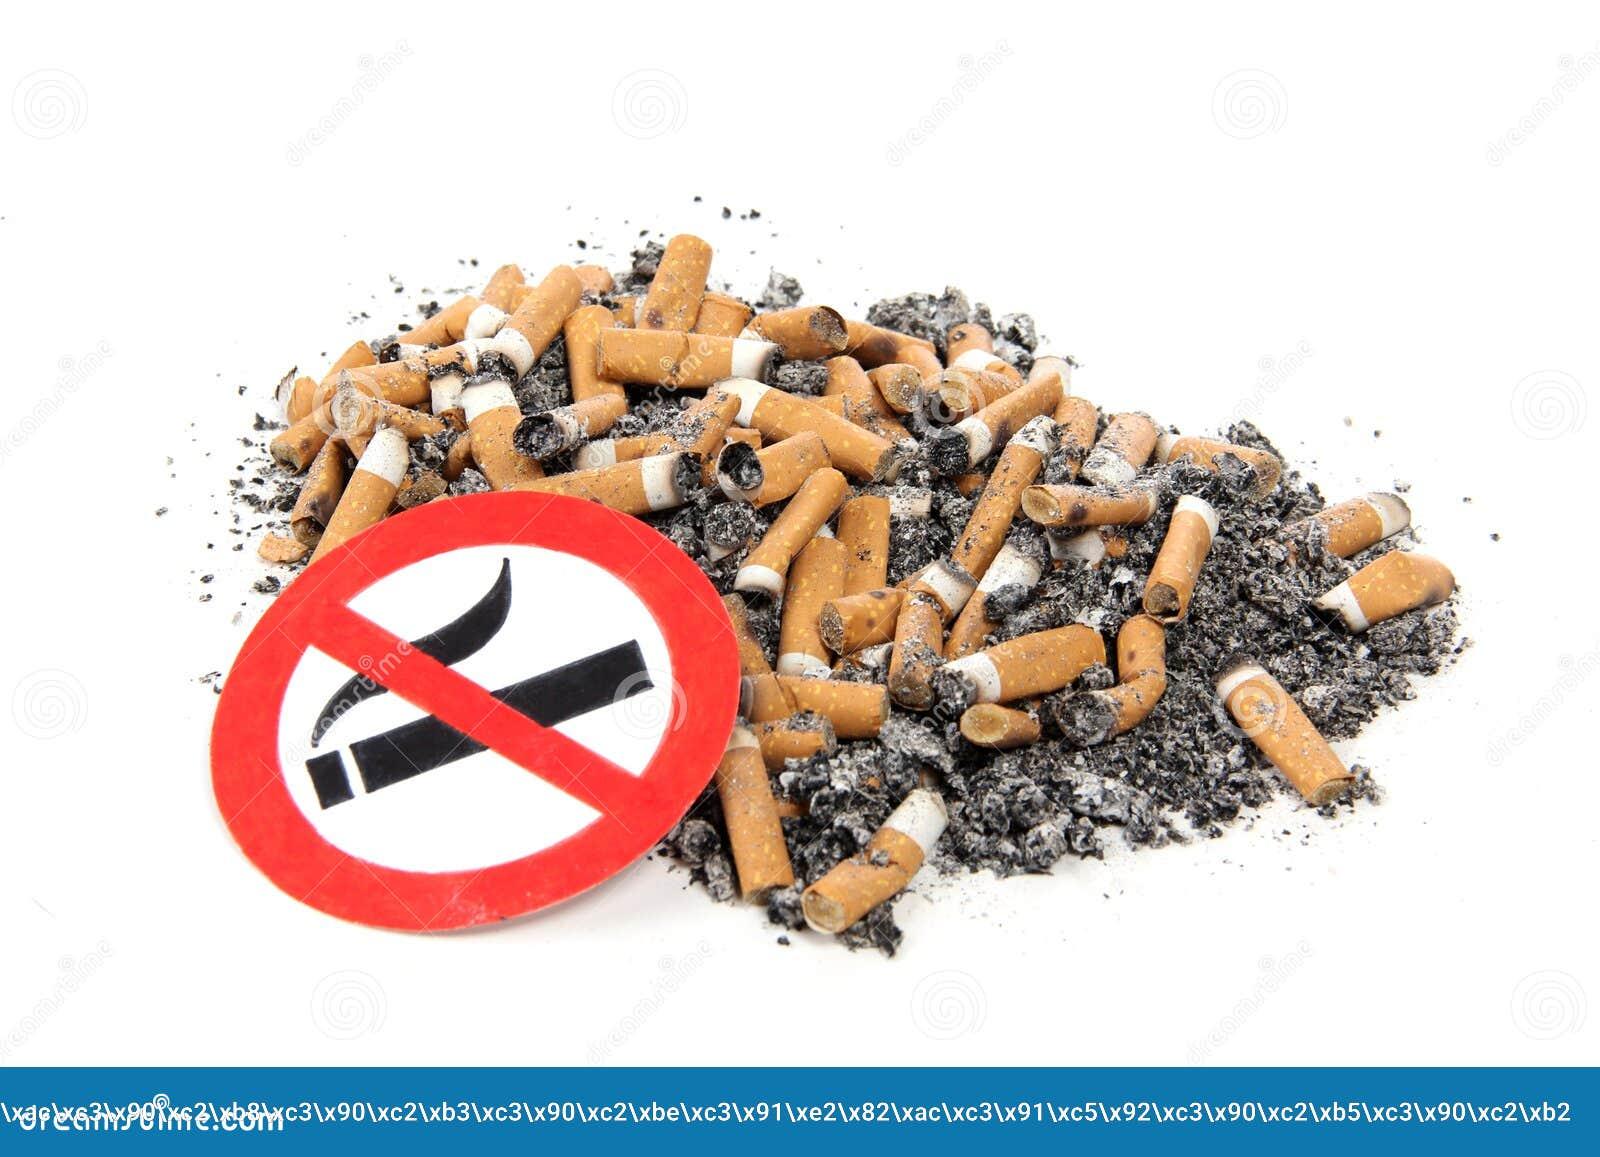 Ashtray τσιγάρο στο λευκό